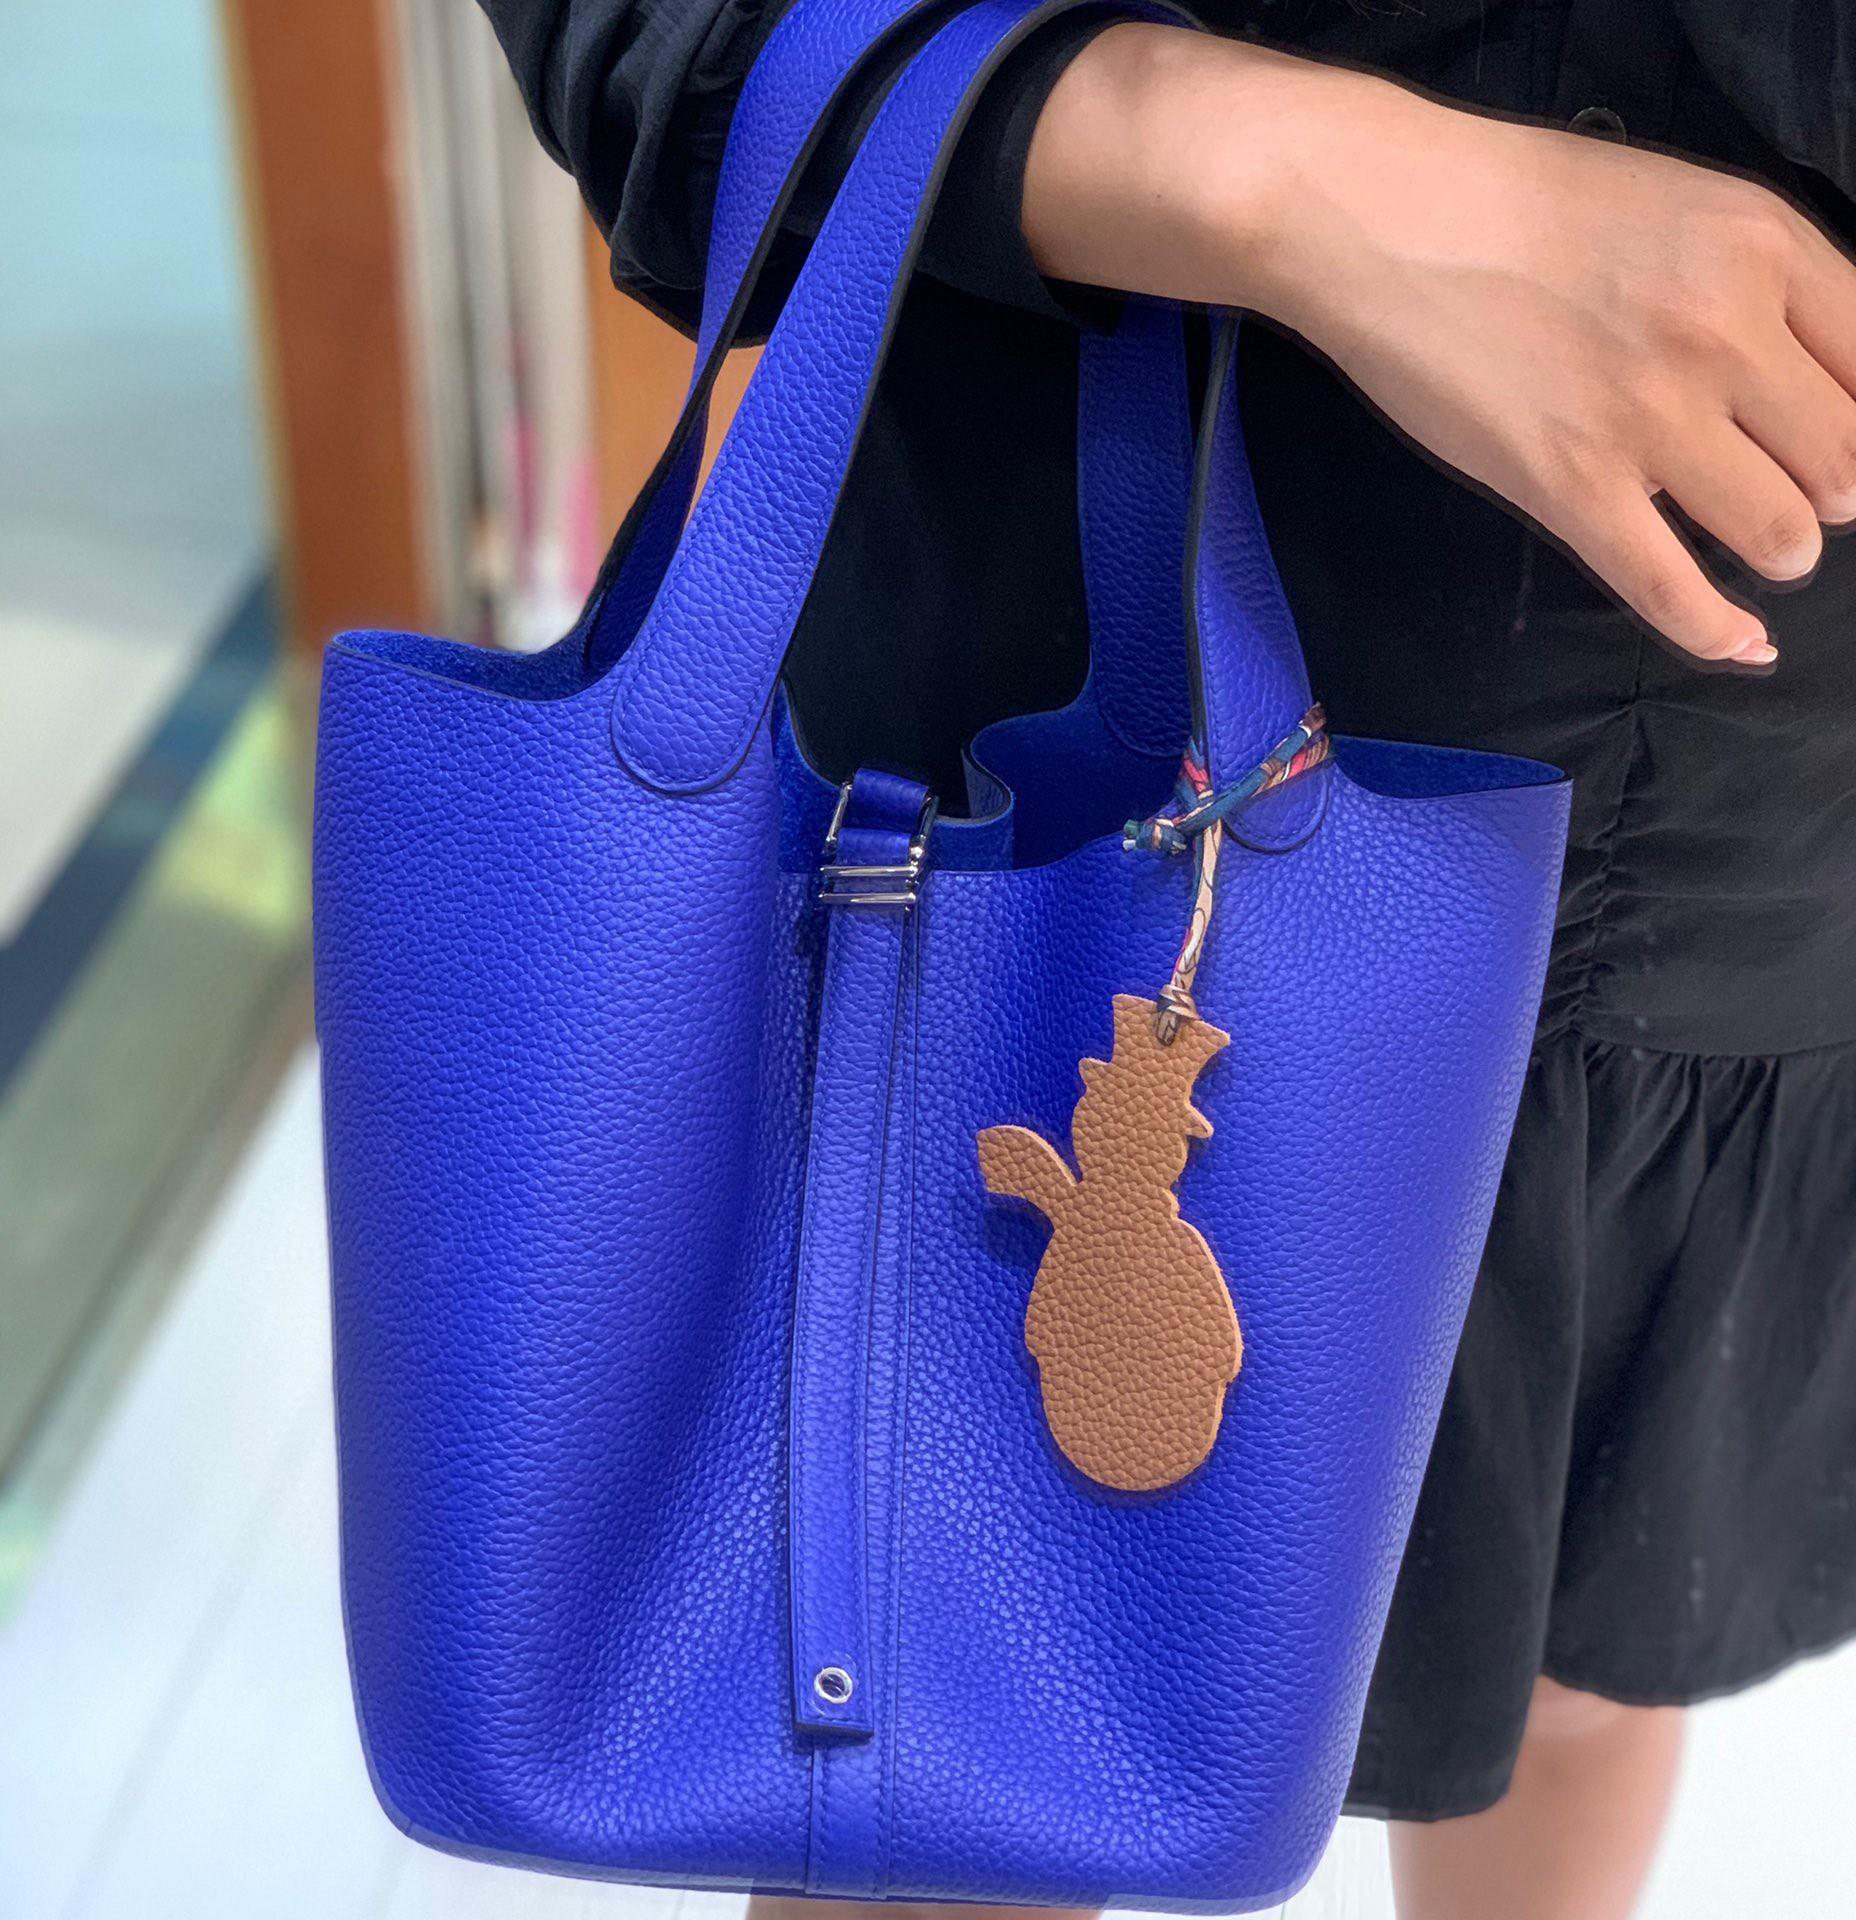 Hermès(爱马仕)Picotin 菜篮子 TC 琉璃蓝 银扣 22cm